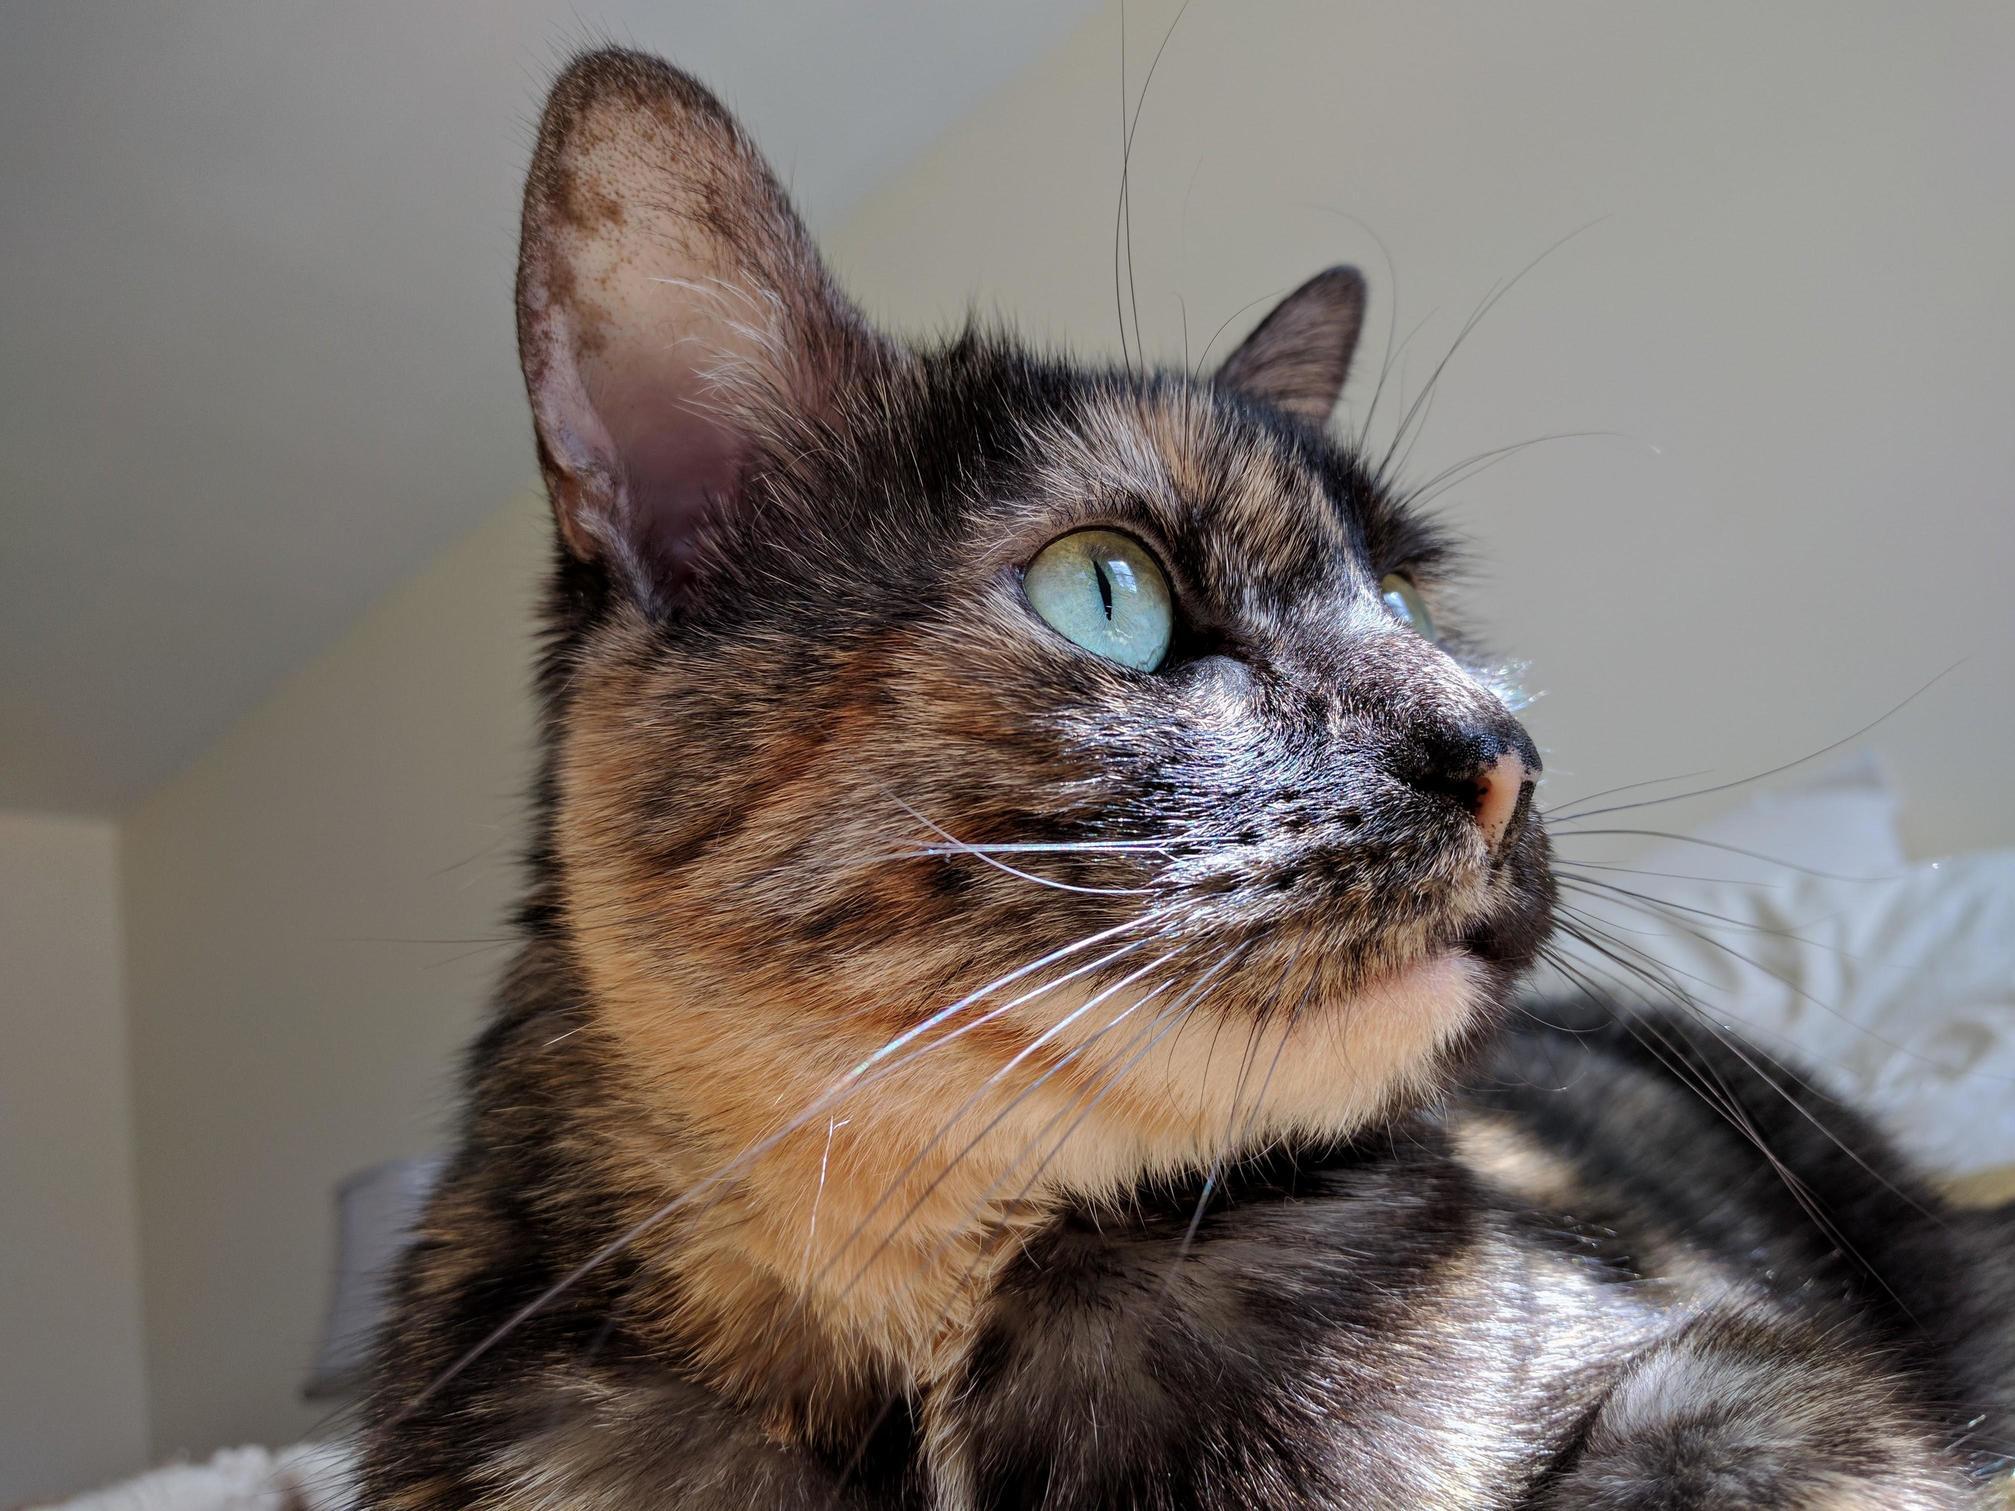 She sees a bird